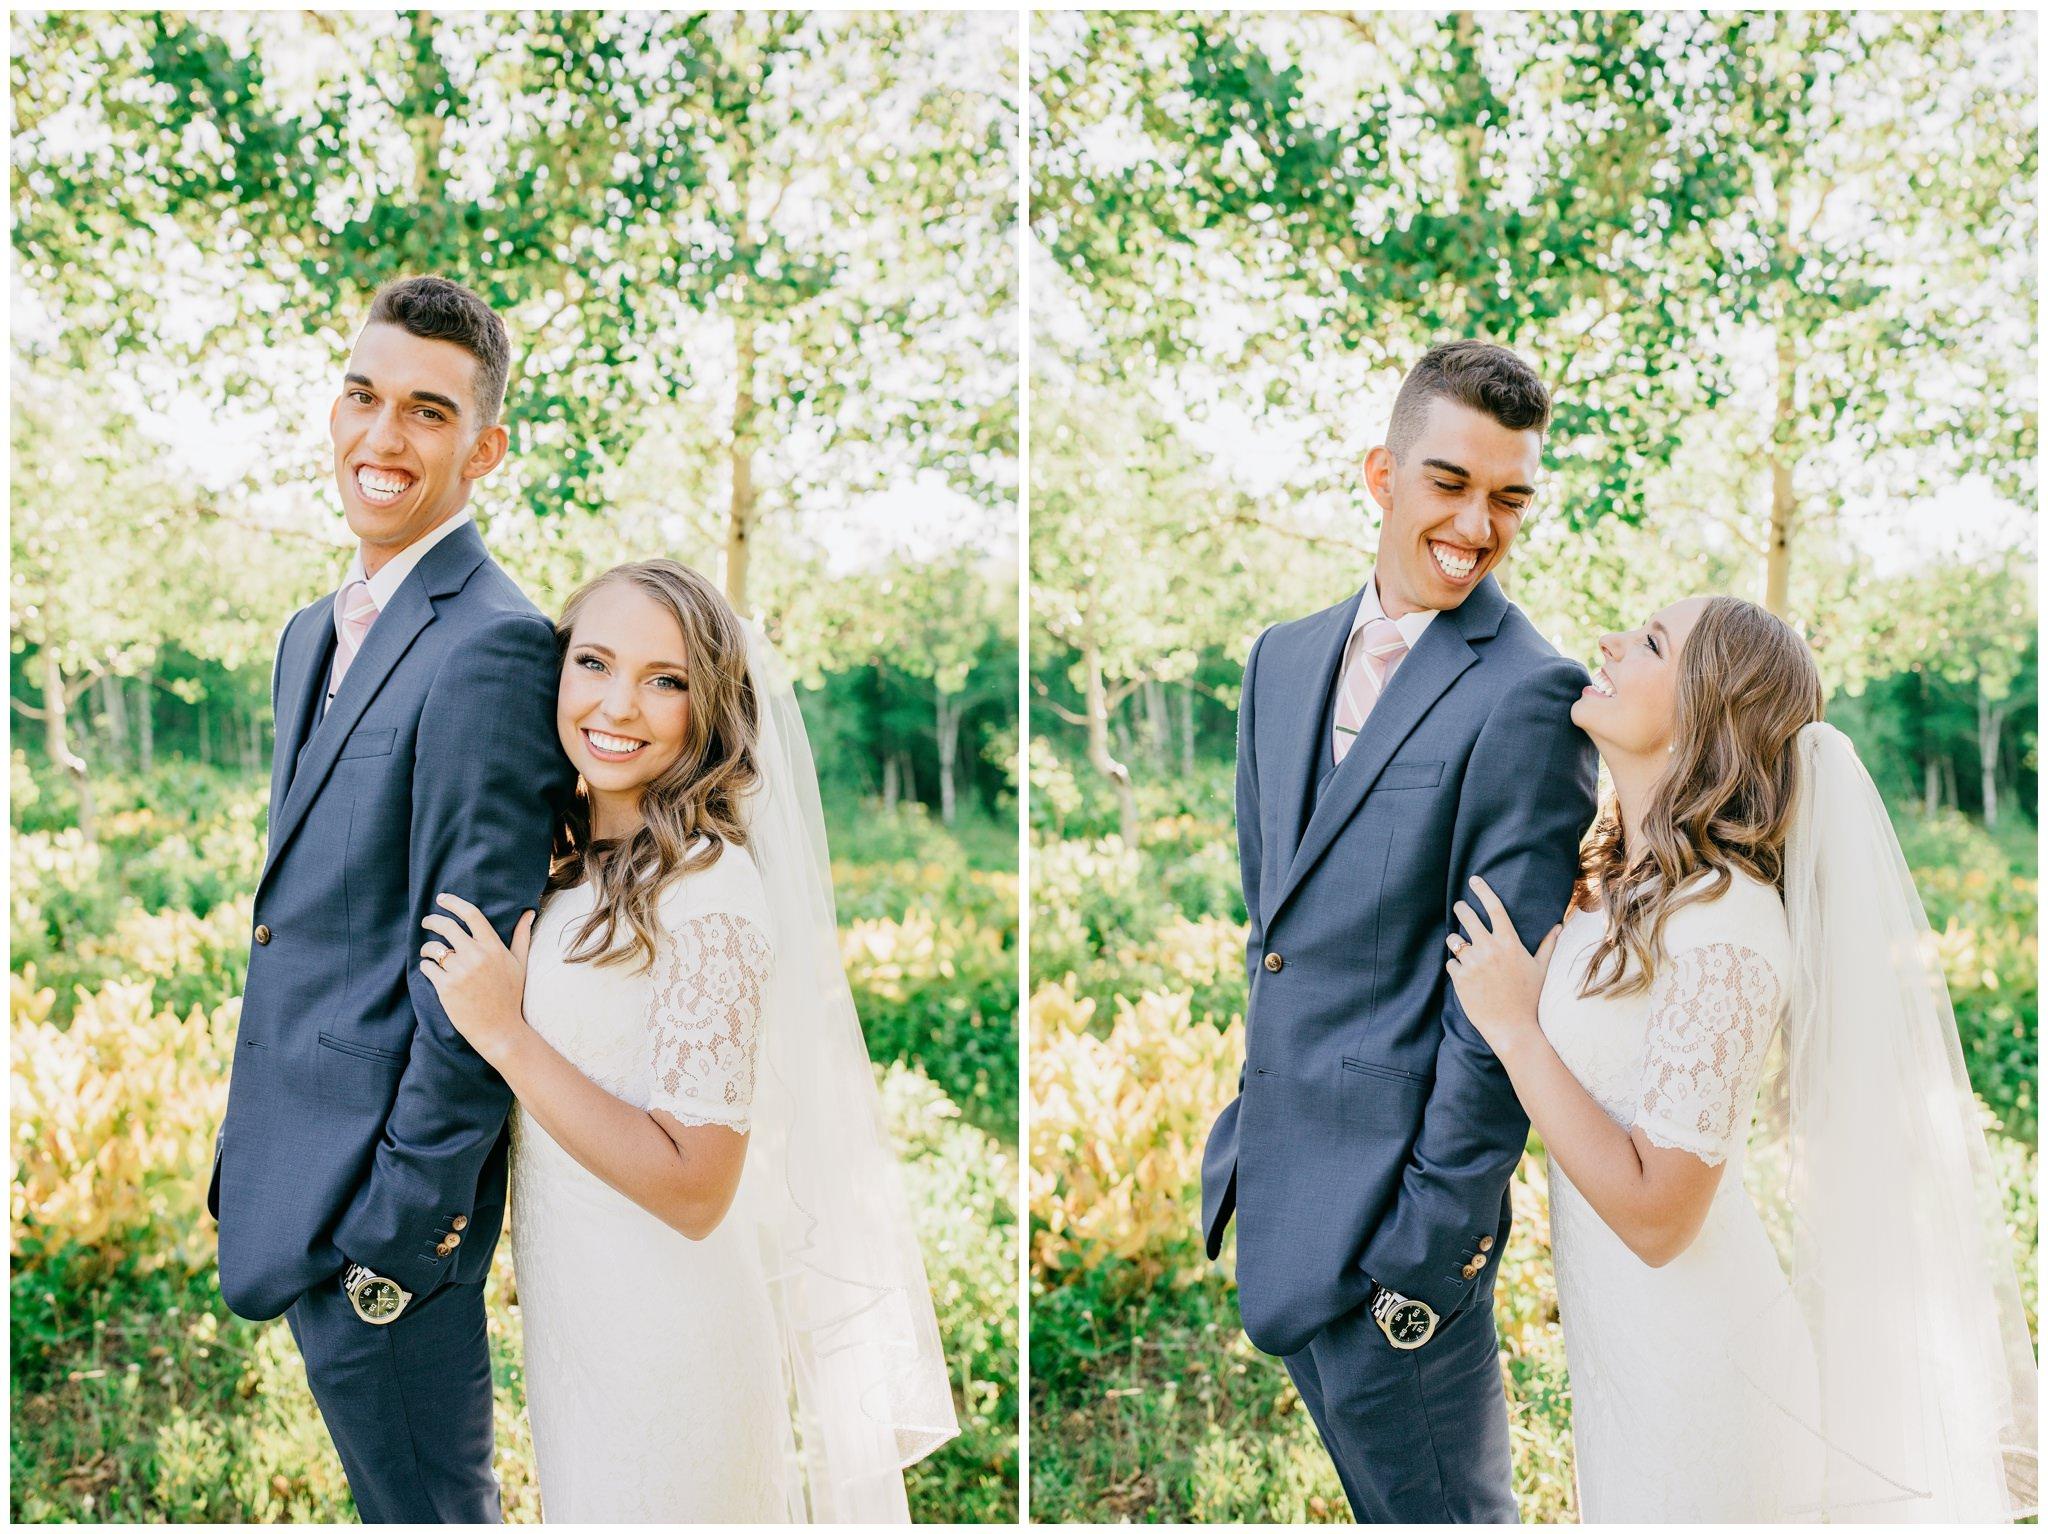 Summer bridals in provo canyo, utah